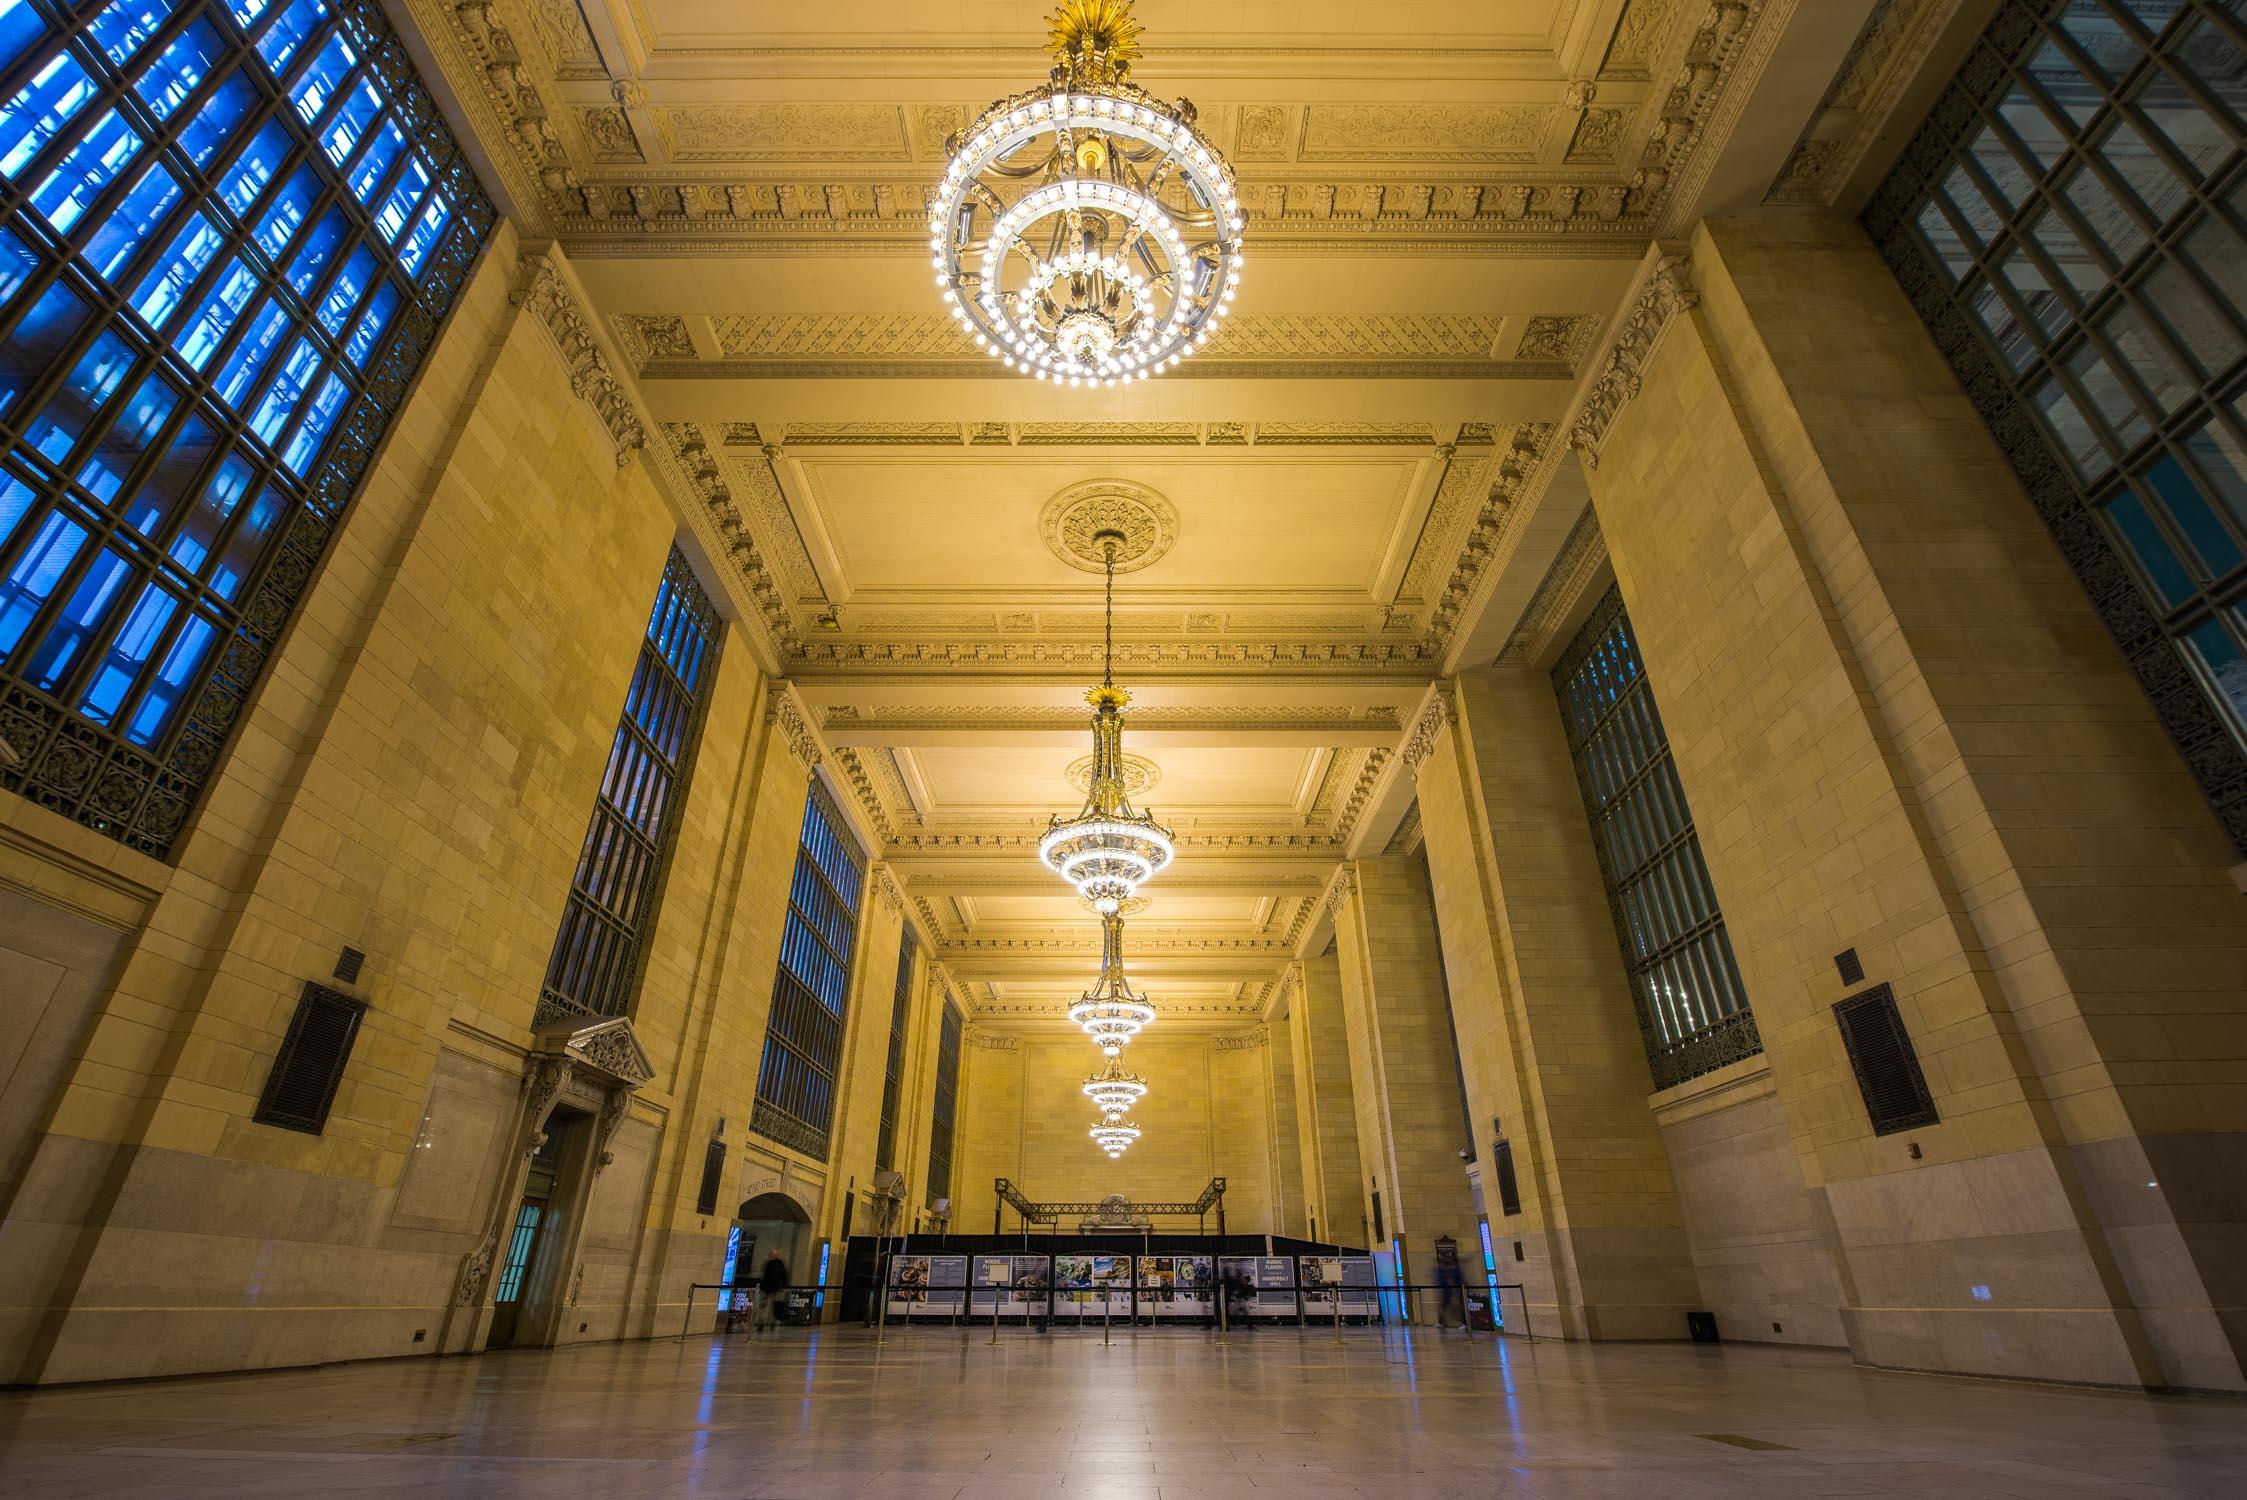 Vanderbuilt Hall , the original waiting room for Grand Central Terminal passengers.